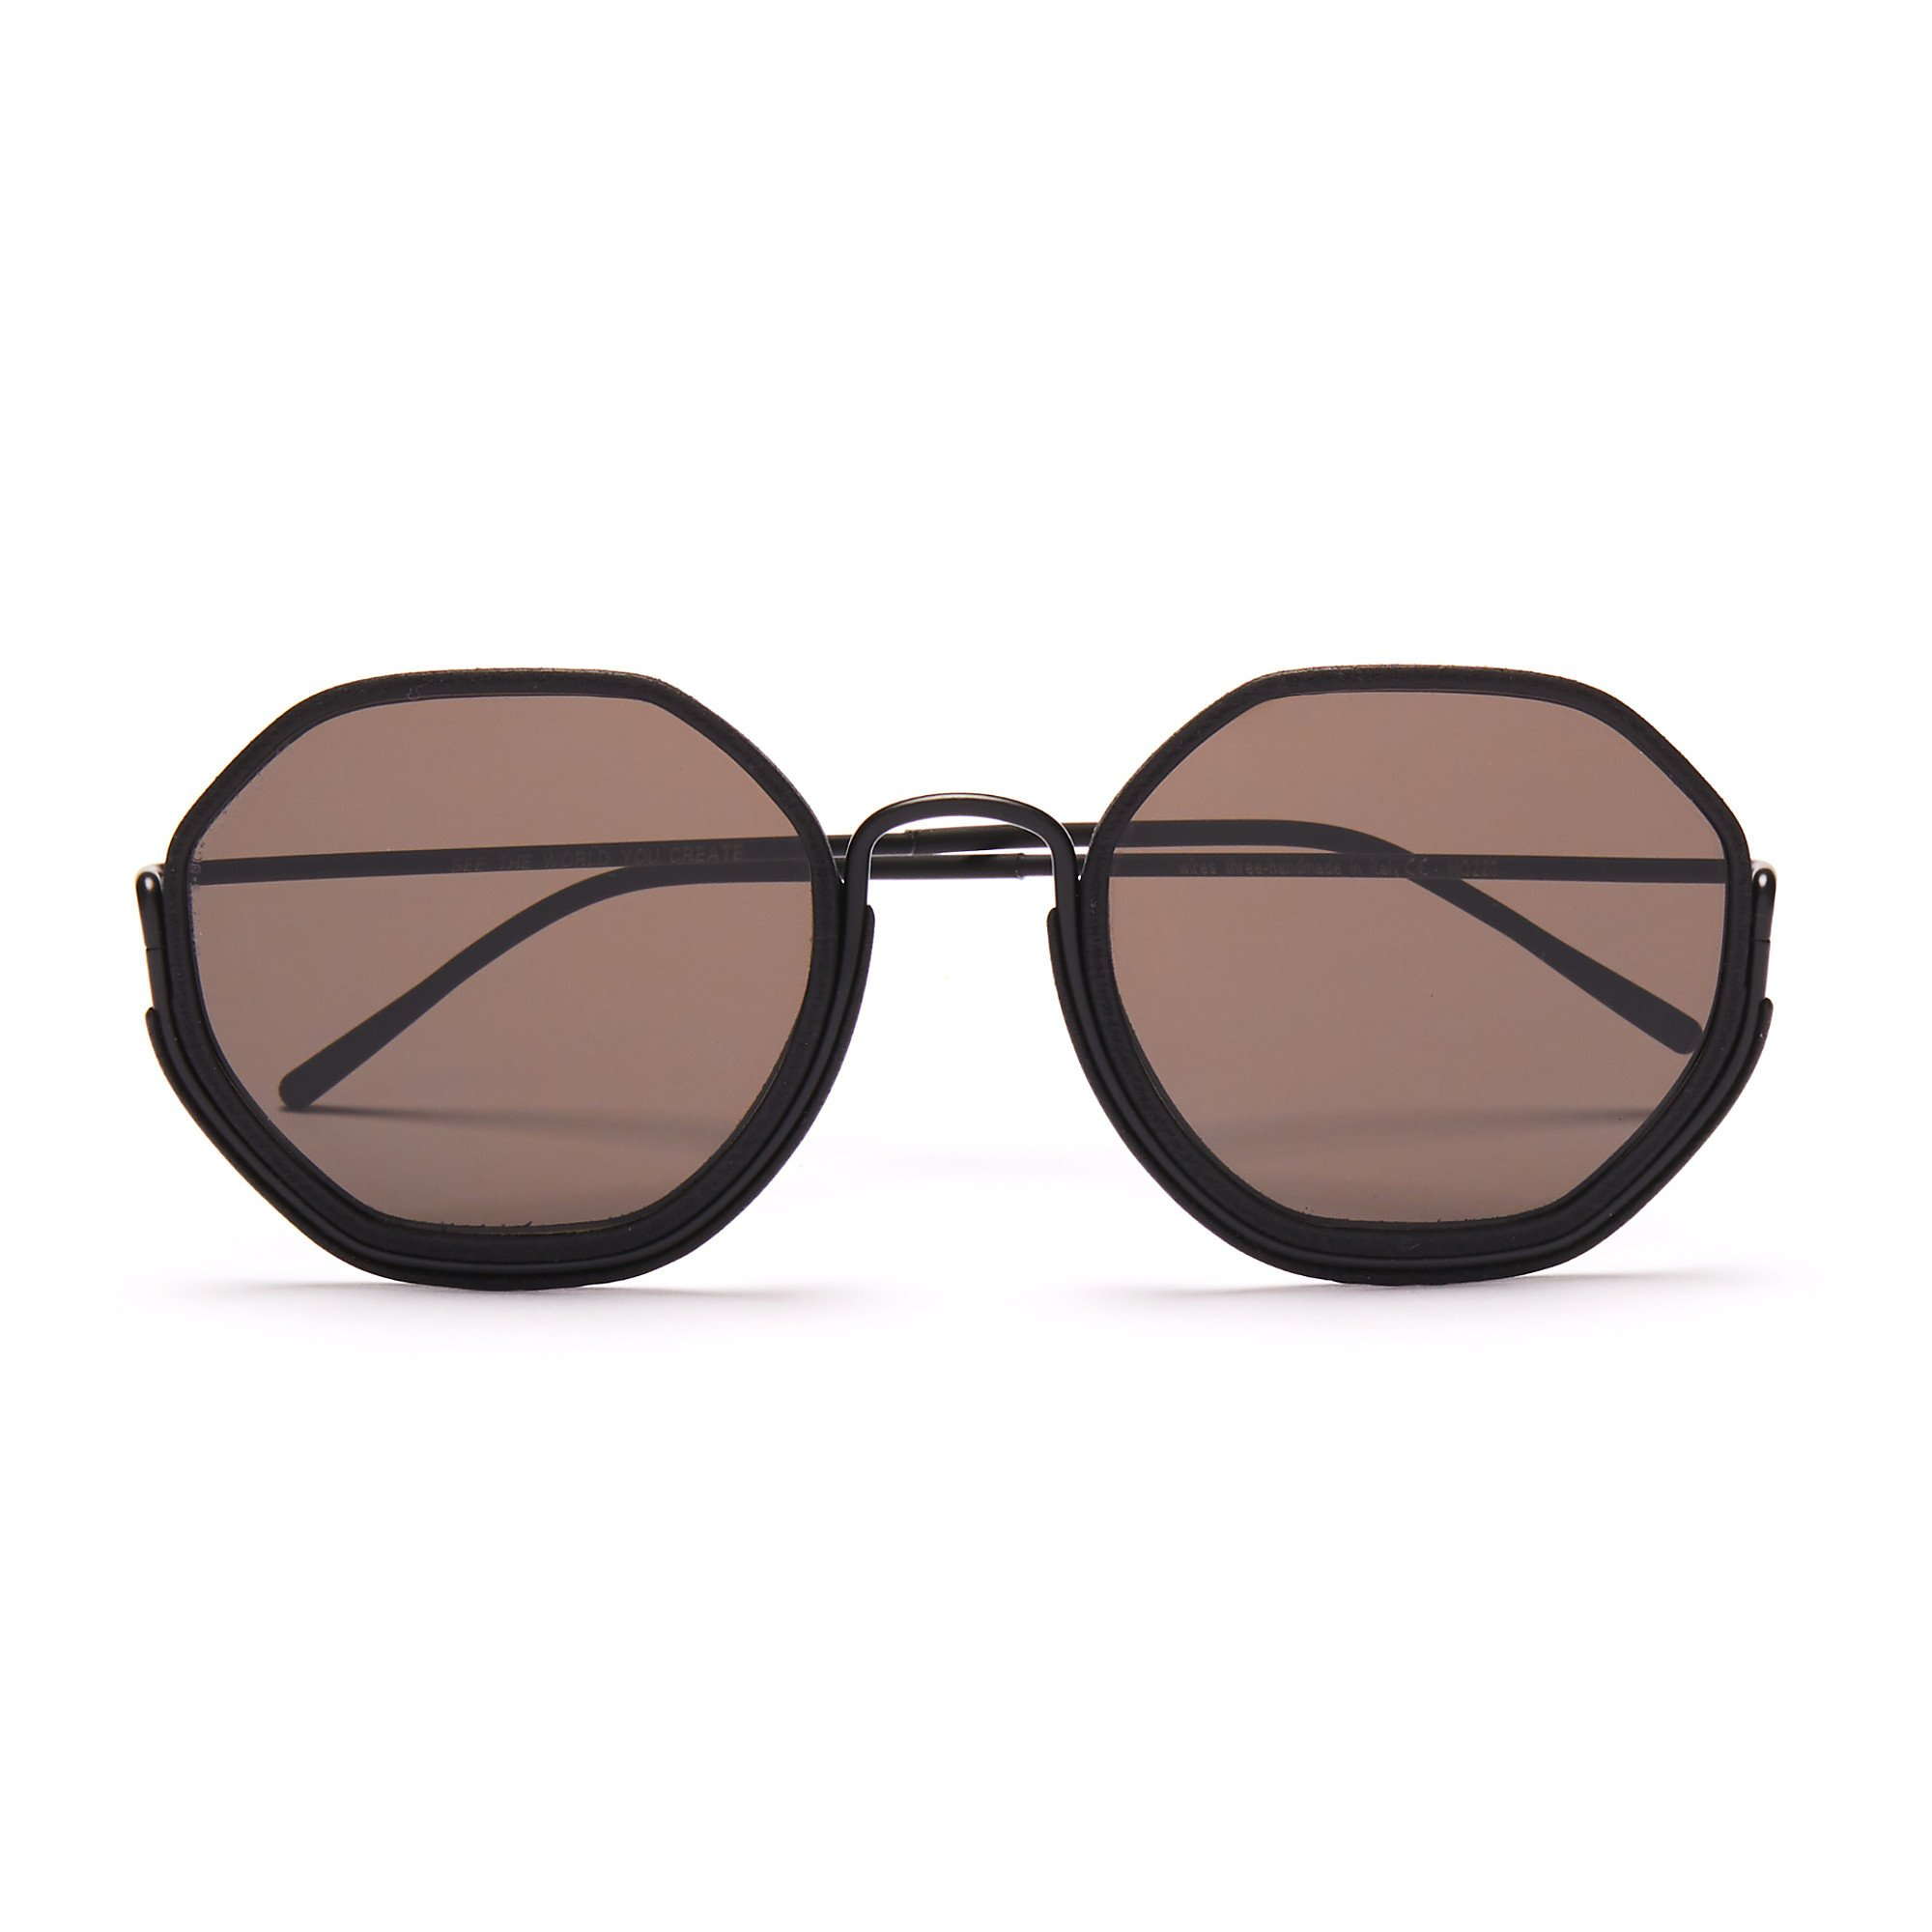 Wires Glasses Honeys Sunglasses